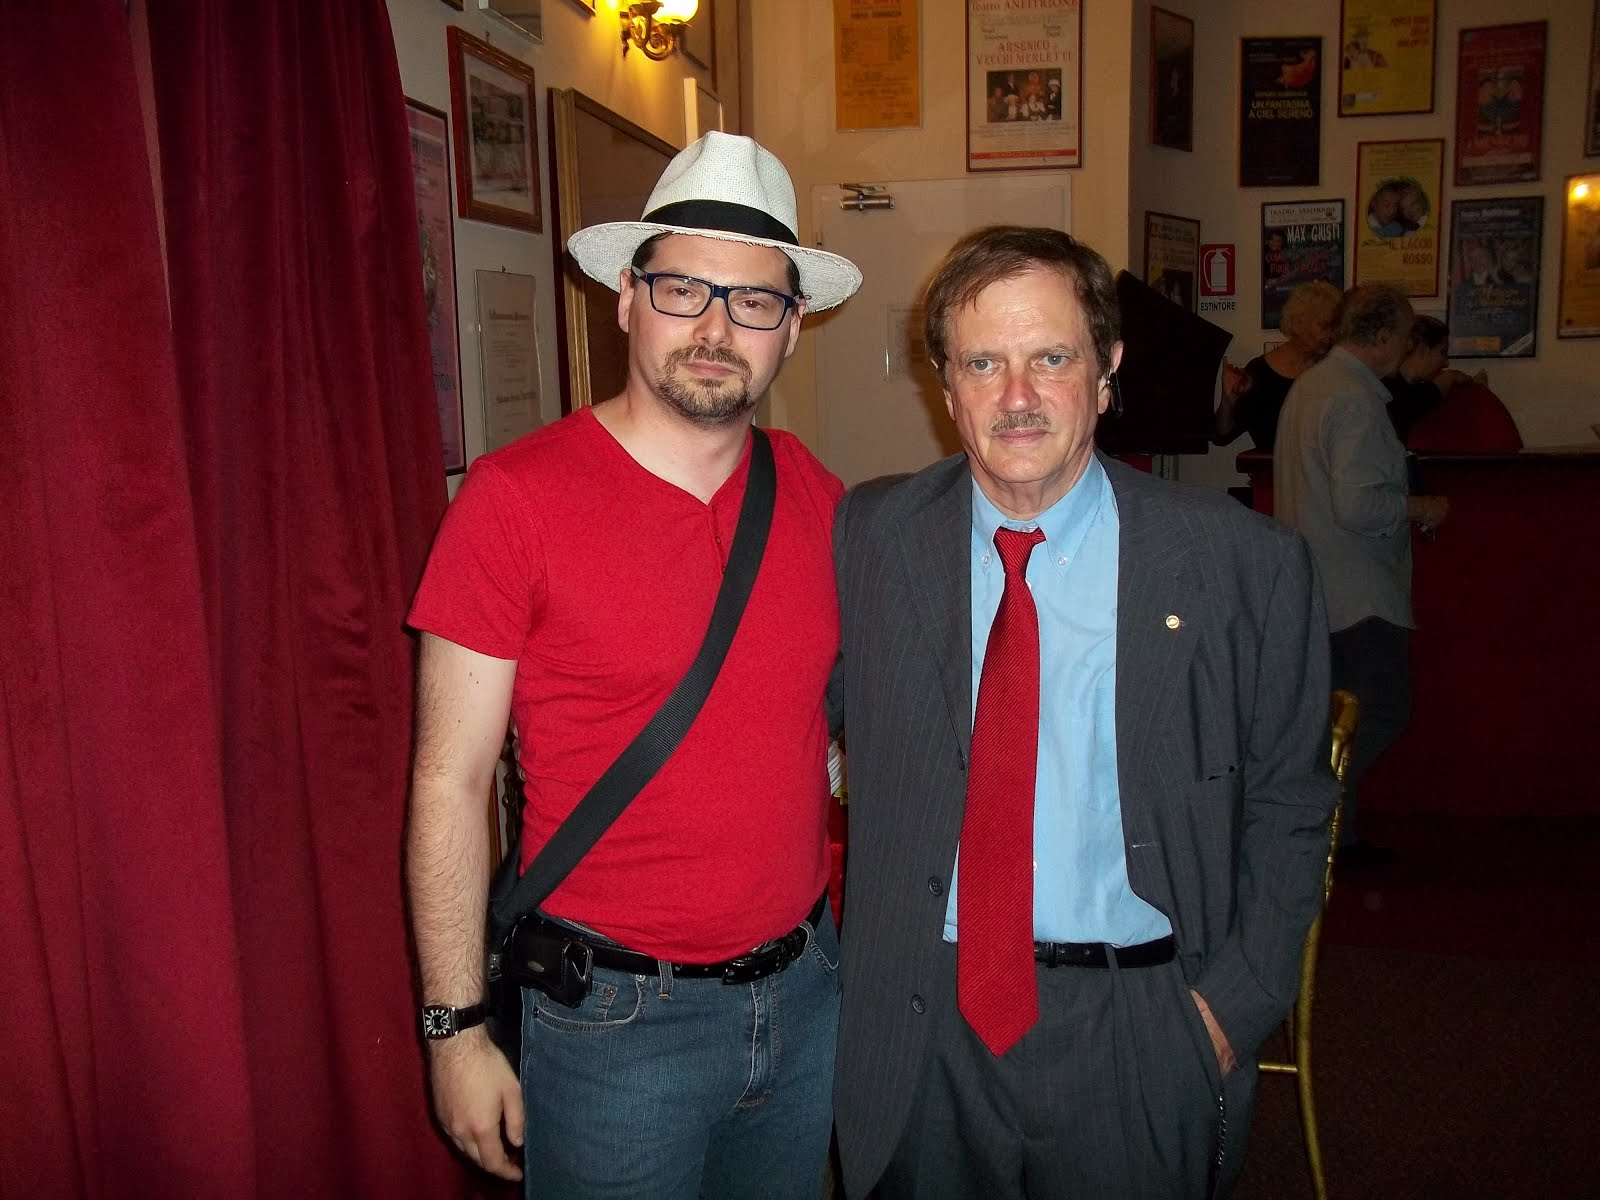 Luca Bagatin con Luigi Pruneti (giugno 2017)